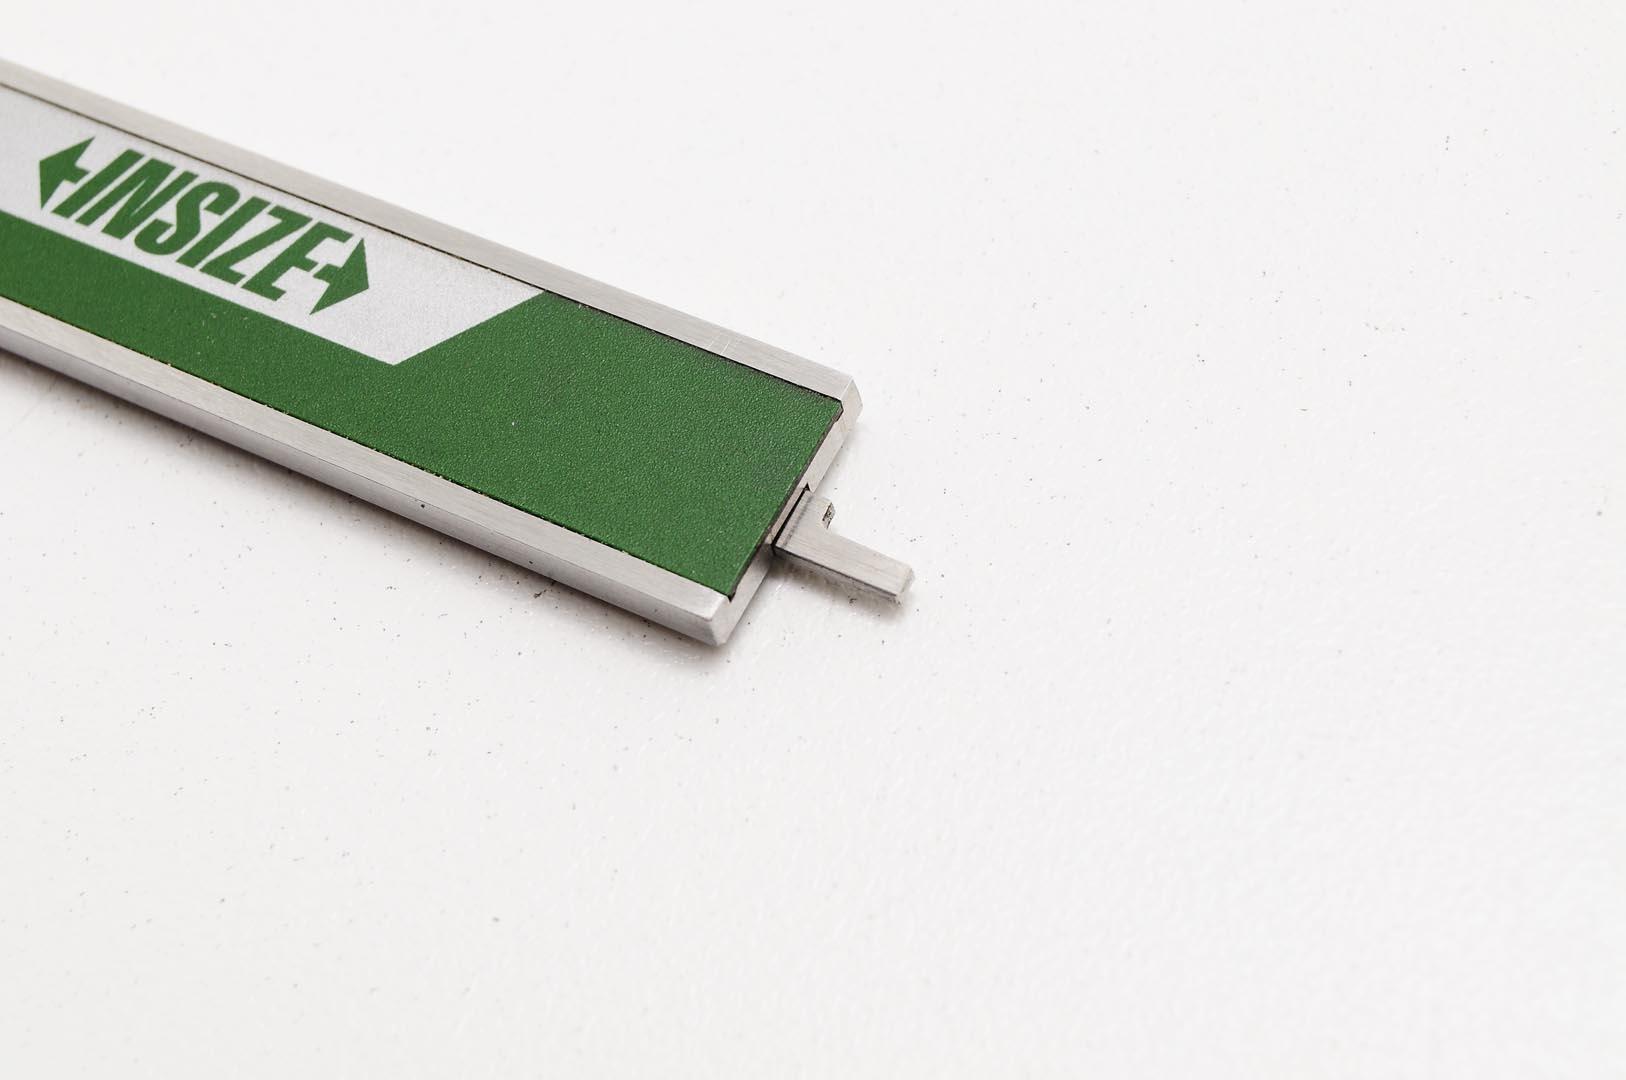 1112-150-Pie de rey, calibrador Digital 0-150mm 1112-150-max-3.